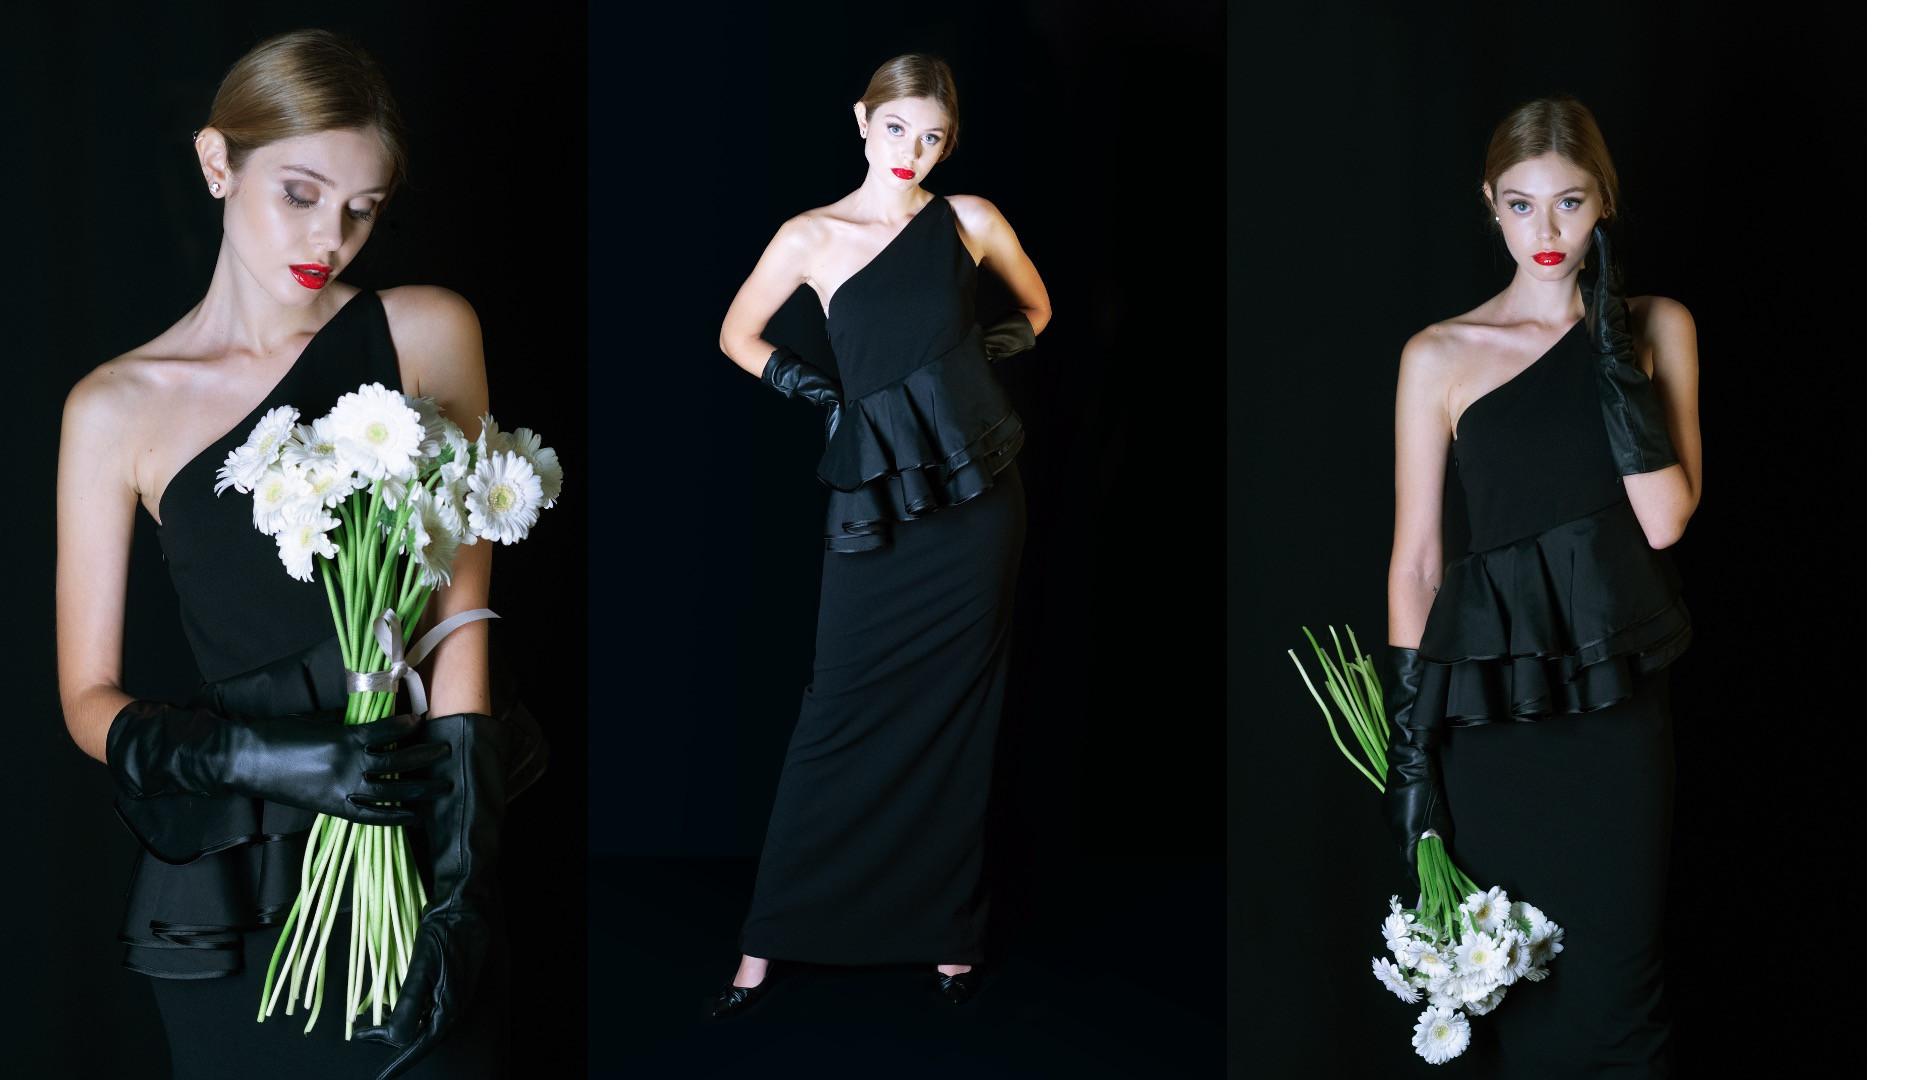 Modelo, styling, fotografia e makeup